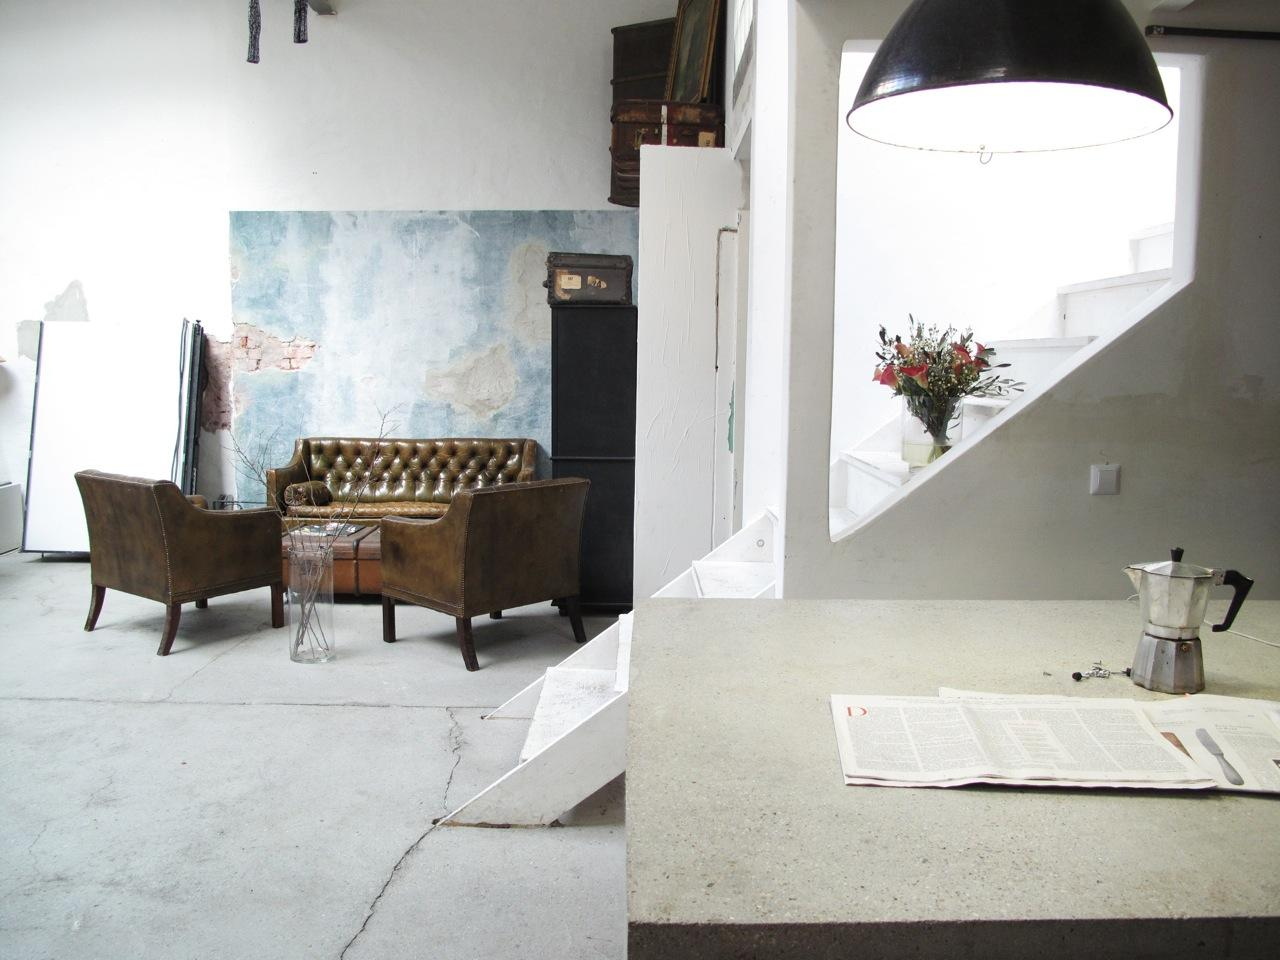 industriestil k che bilder ideen couchstyle. Black Bedroom Furniture Sets. Home Design Ideas